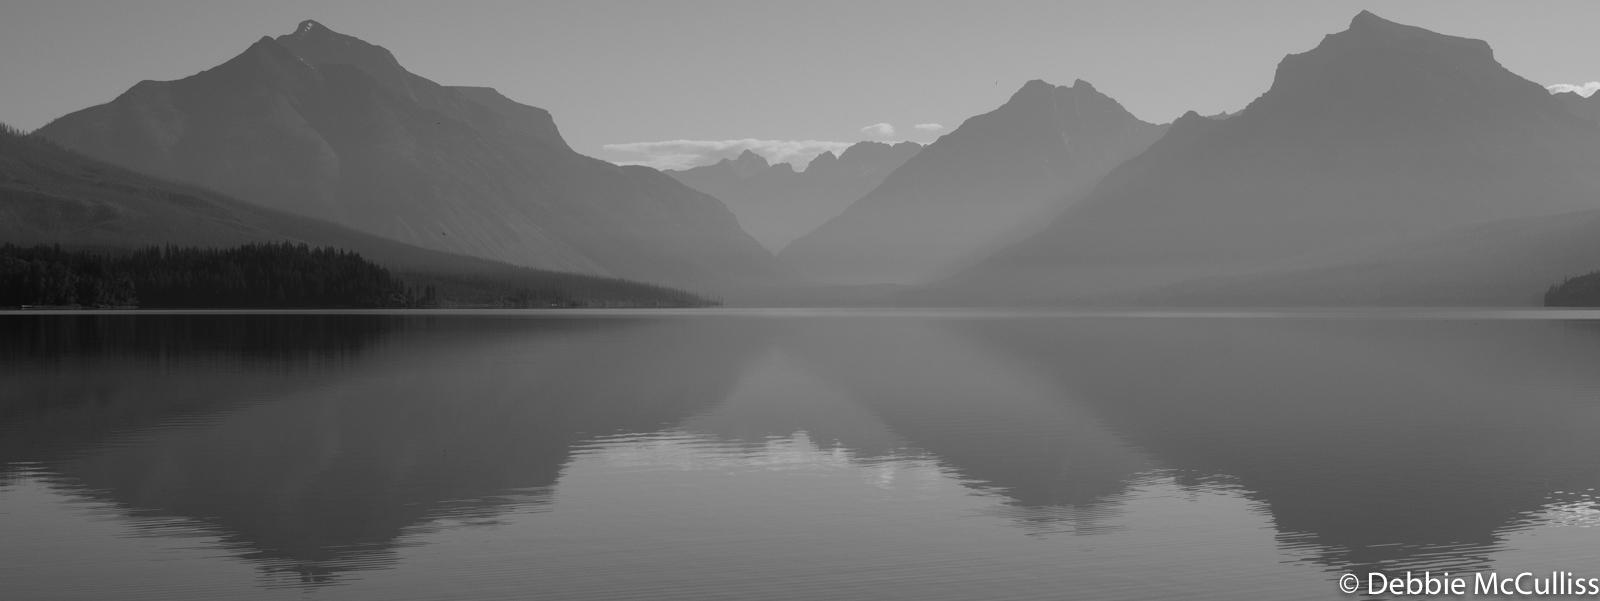 Lake McDonald, Glacier National Park, Montana, photo